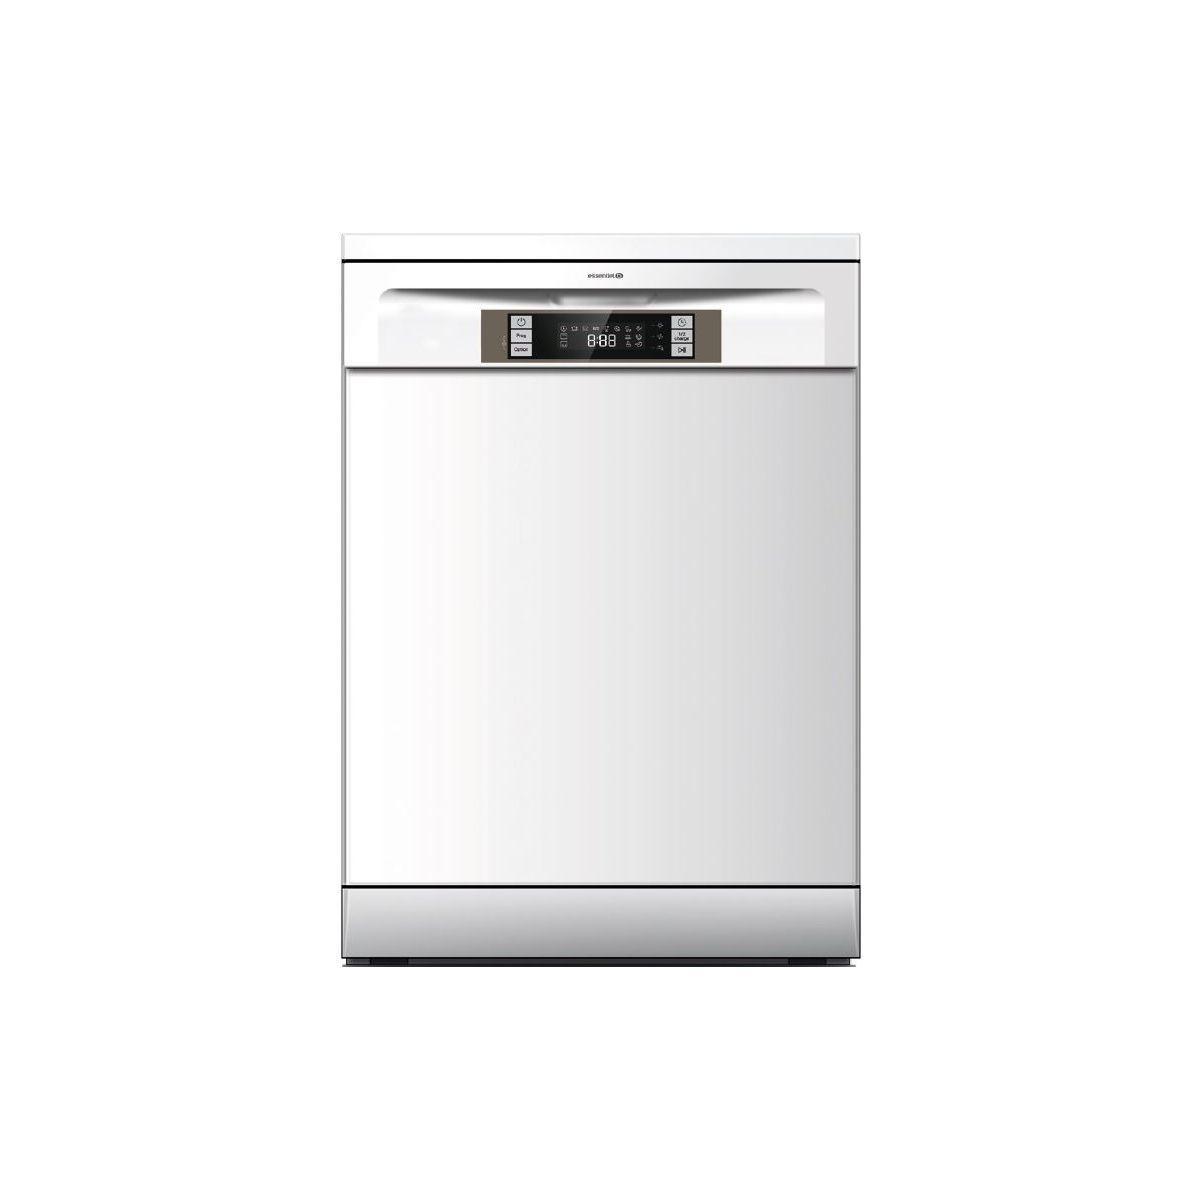 Lave-vaisselle 60cm ESSENTIELB ELave-vaisselle3-441b (photo)